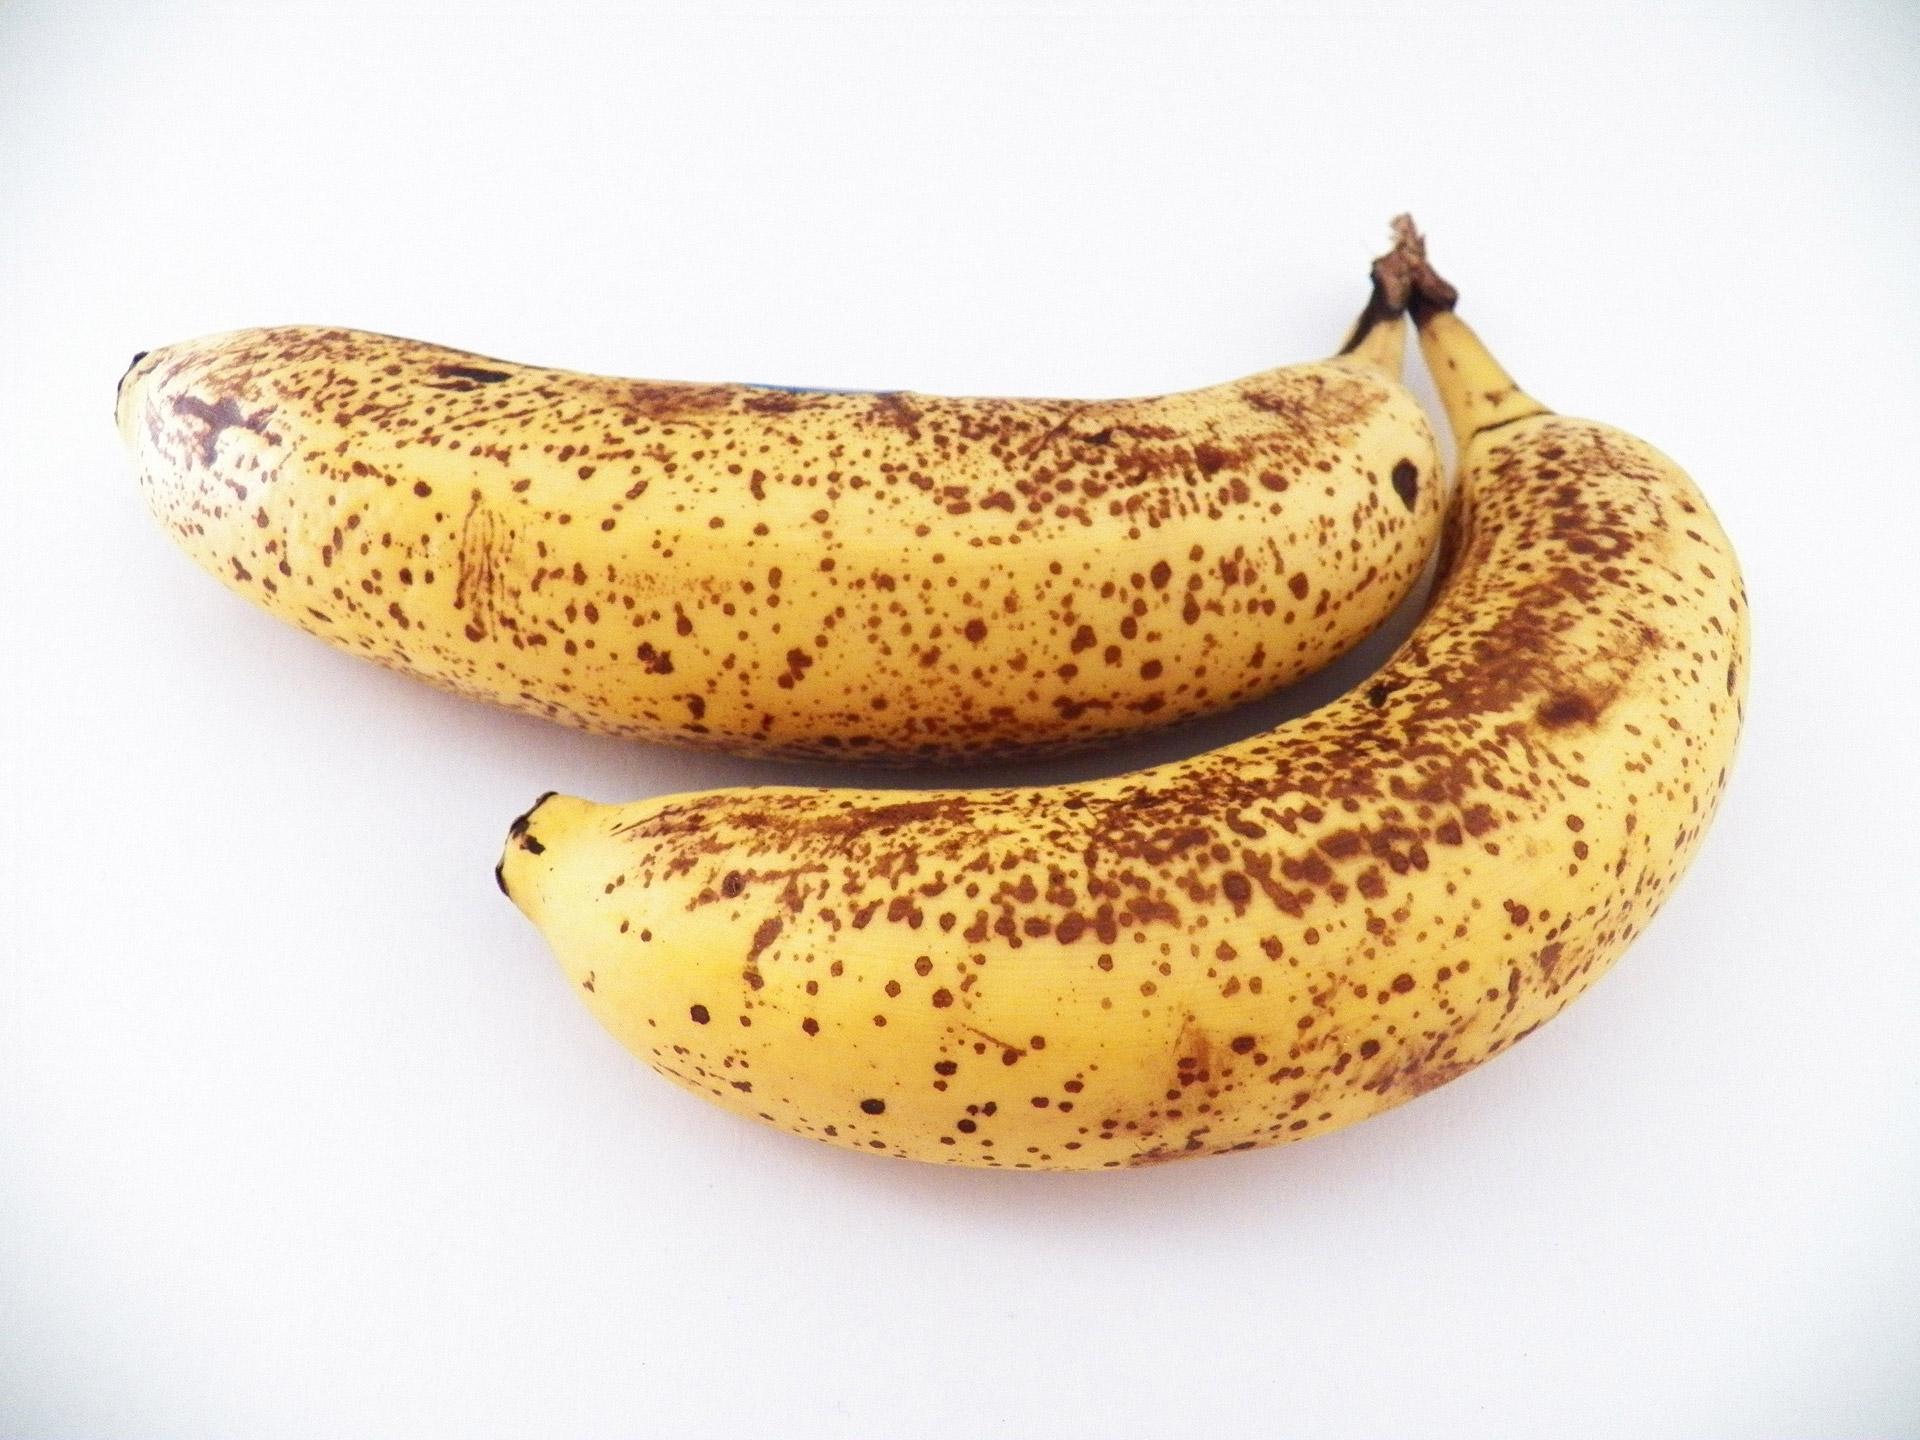 Ripe Bananas Free Stock Photo - Public Domain Pictures